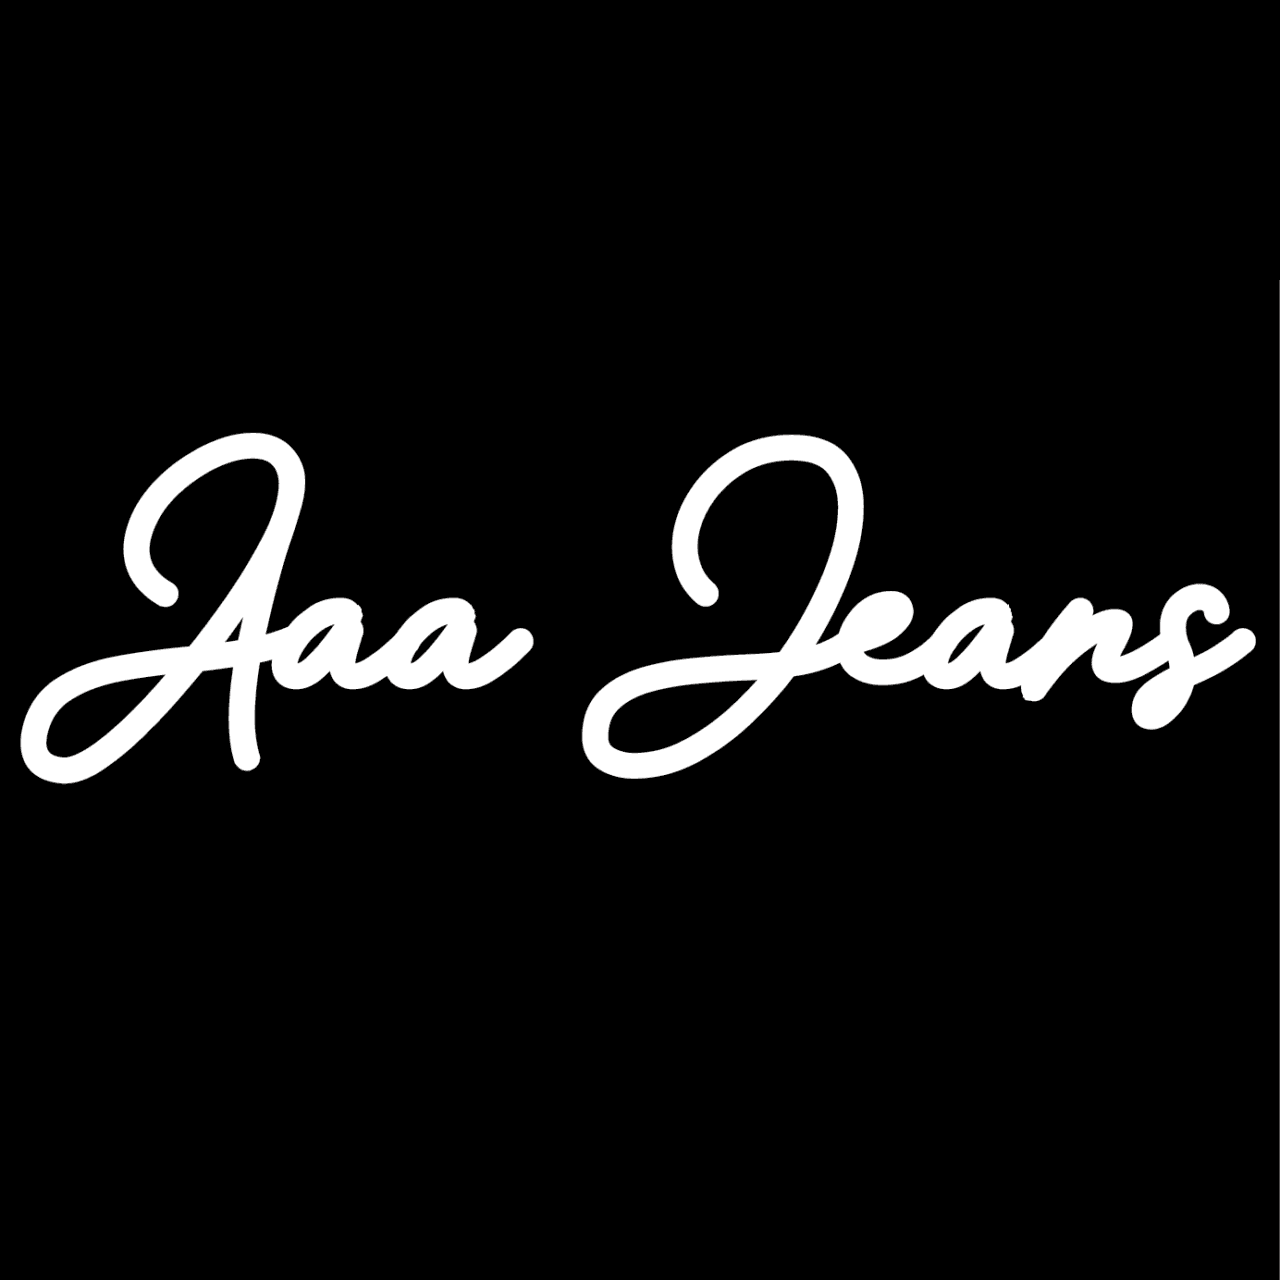 AAA JEANS – Quần Jean Nữ Đẹp